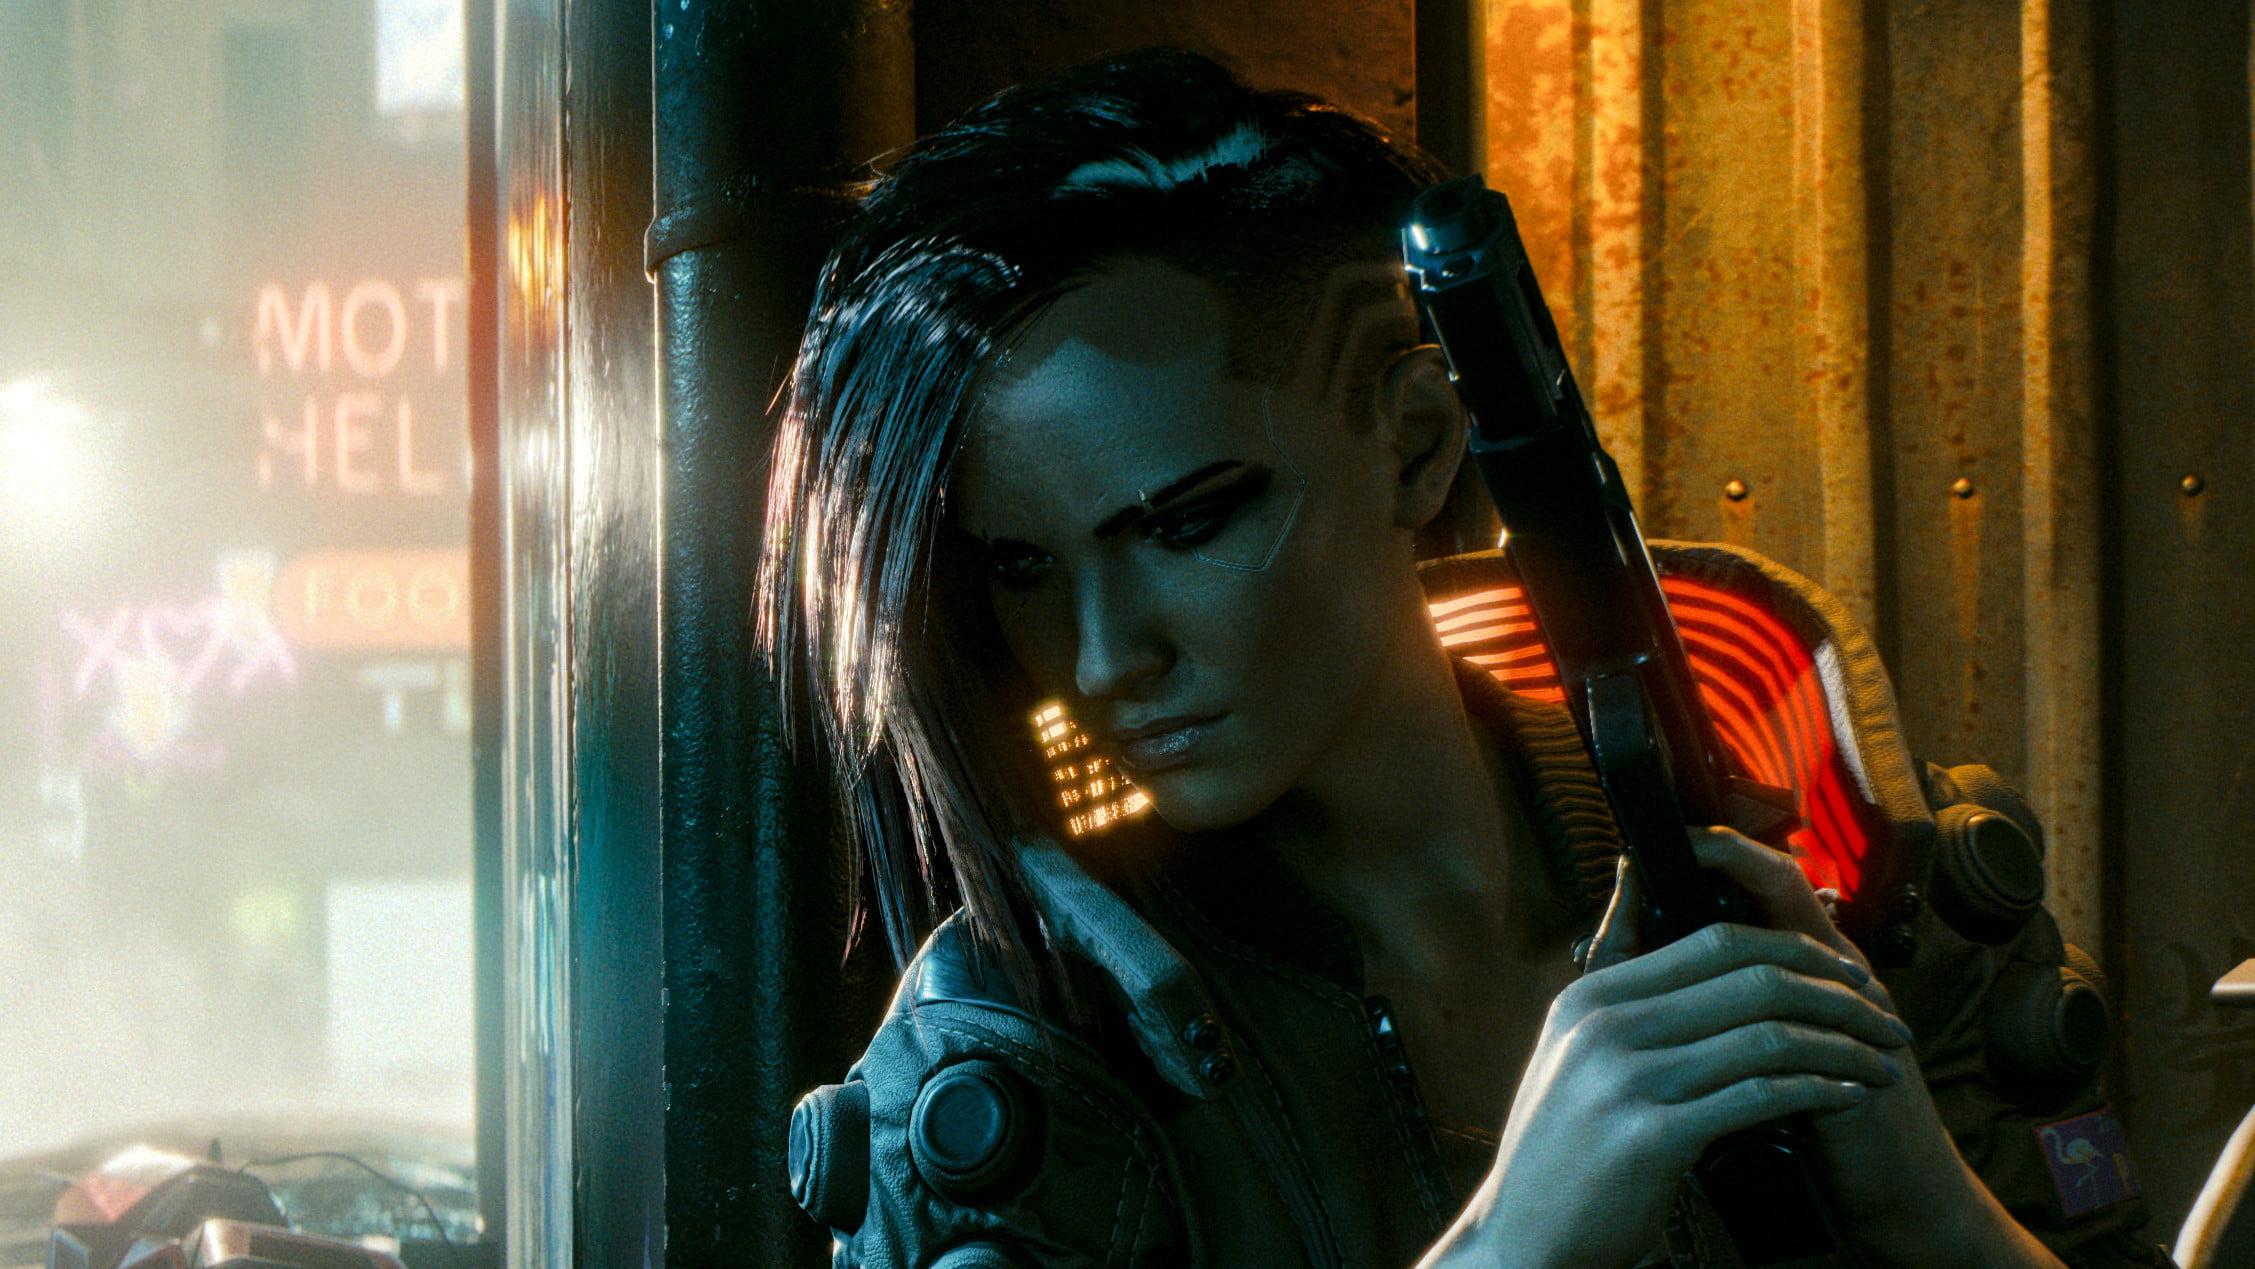 E3 Preview - Cyberpunk 2077 (PC)